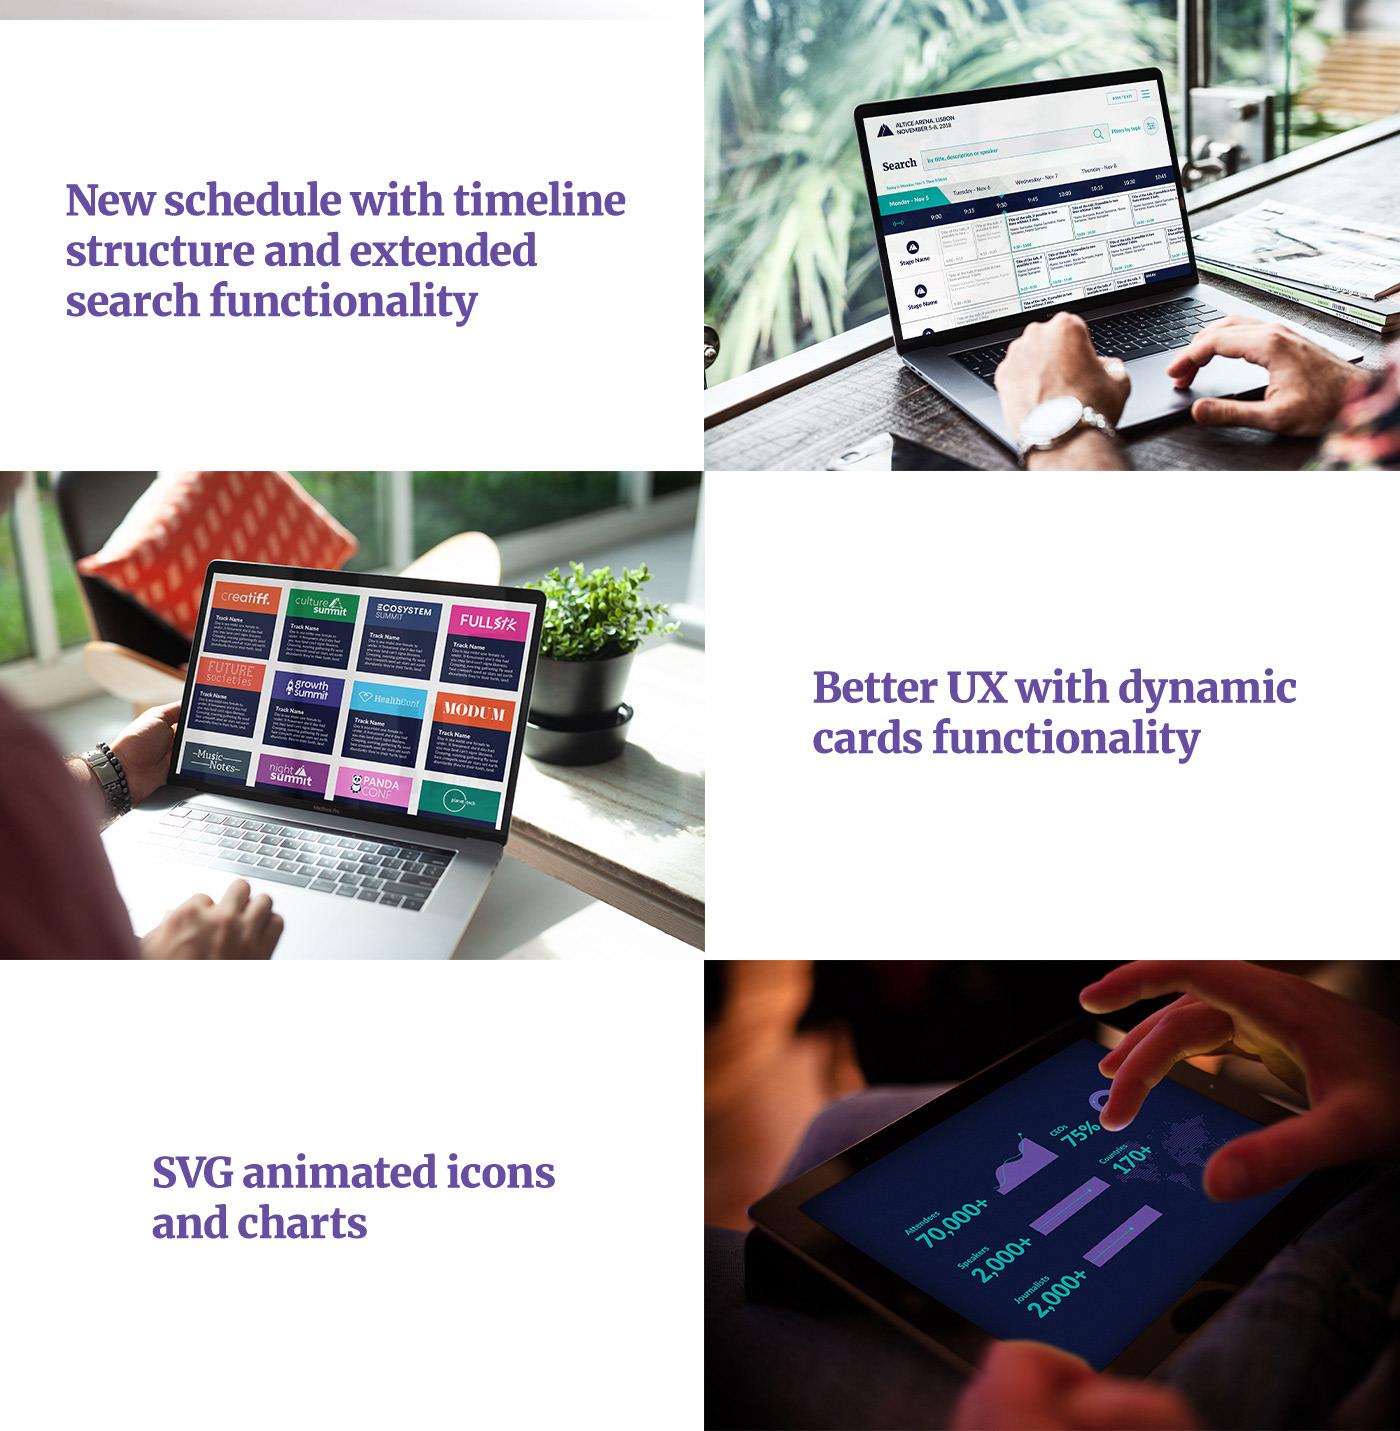 websummit,redesign,uiux,conferences,Startup,Webdesign,Website,modern,minimalistic,colorful